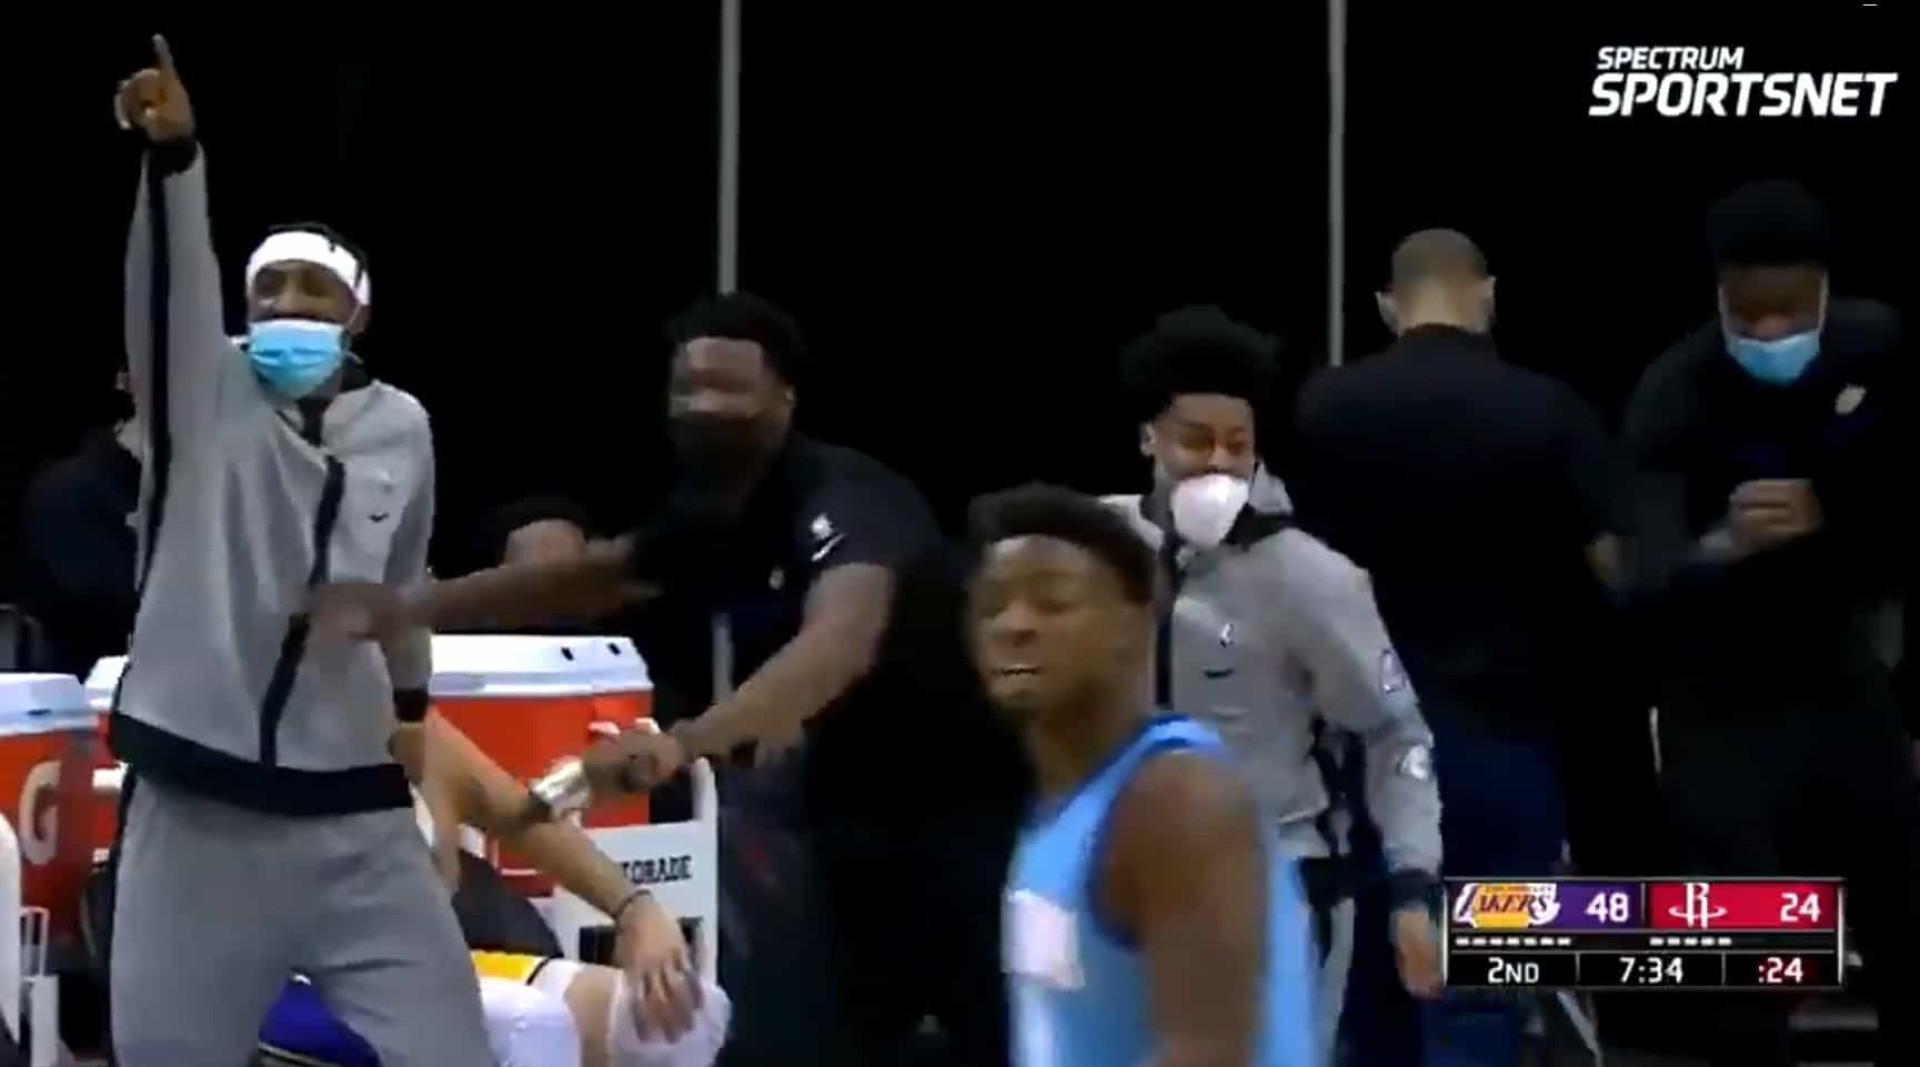 O lance de LeBron James que dá que falar. Lançou e... virou costas